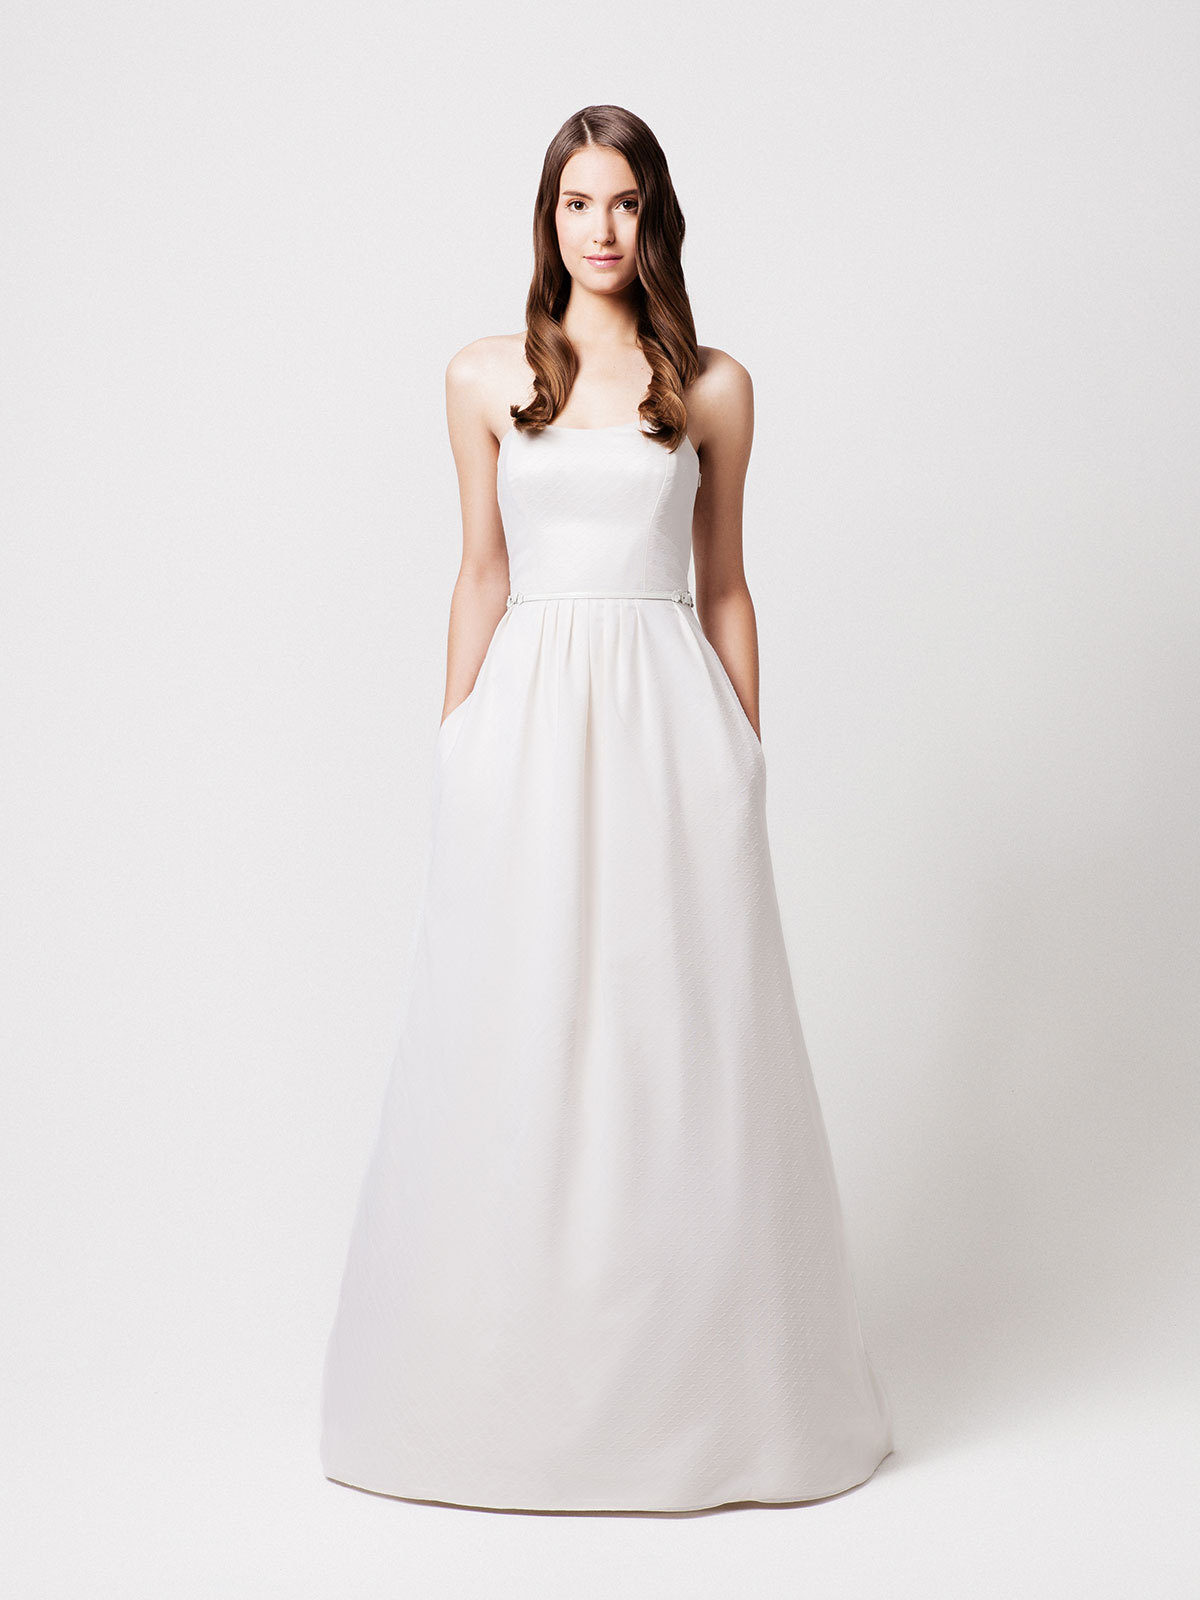 Brautkleid Alara von Kisui auf Ja.de